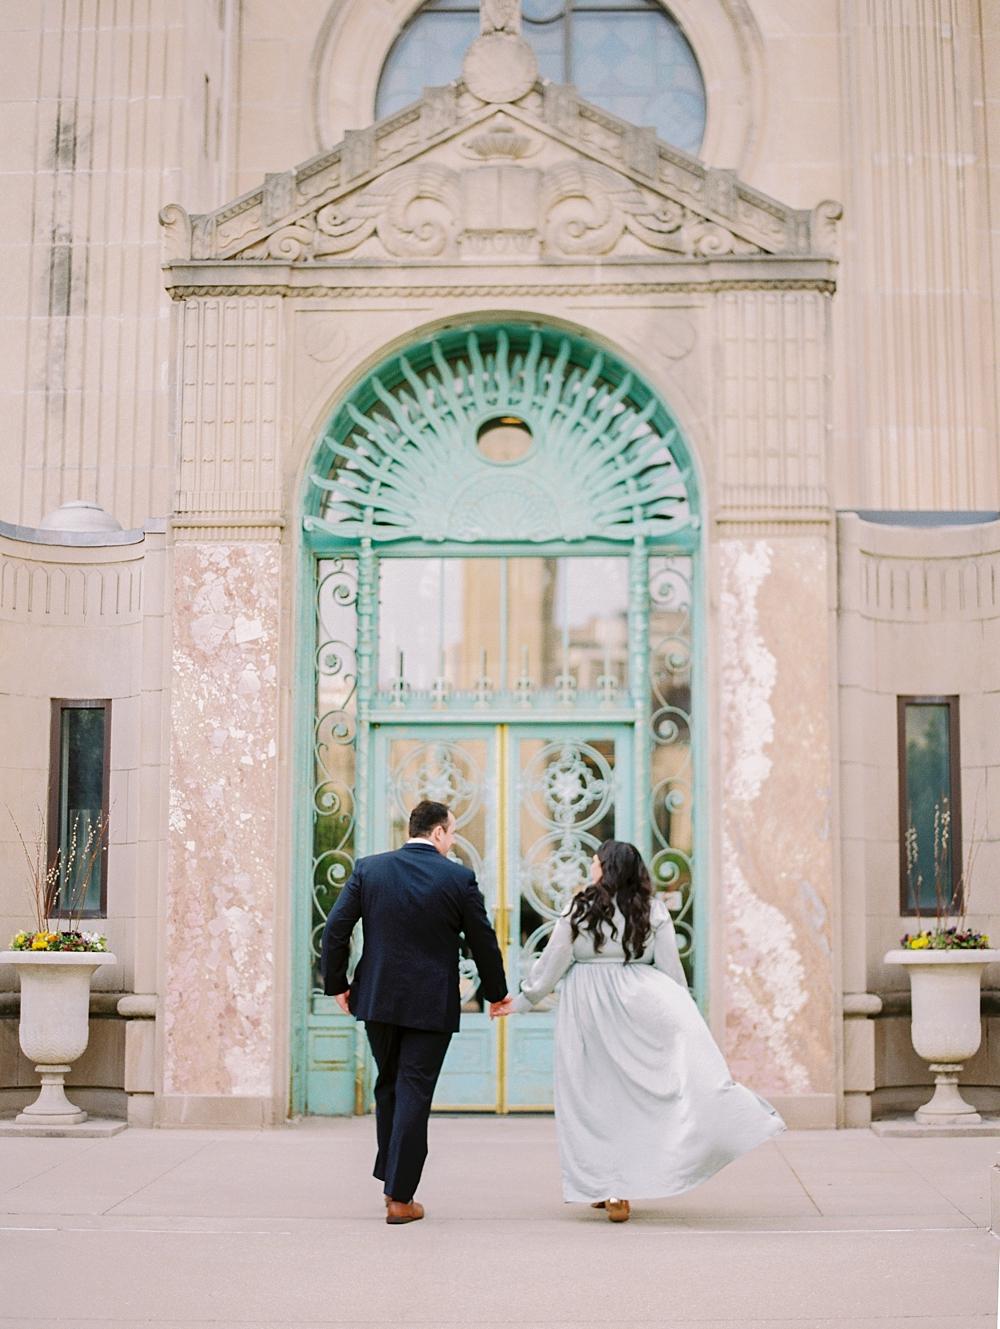 kristin-la-voie-photography-chicago-wedding-photographer-loyola-engagement-14